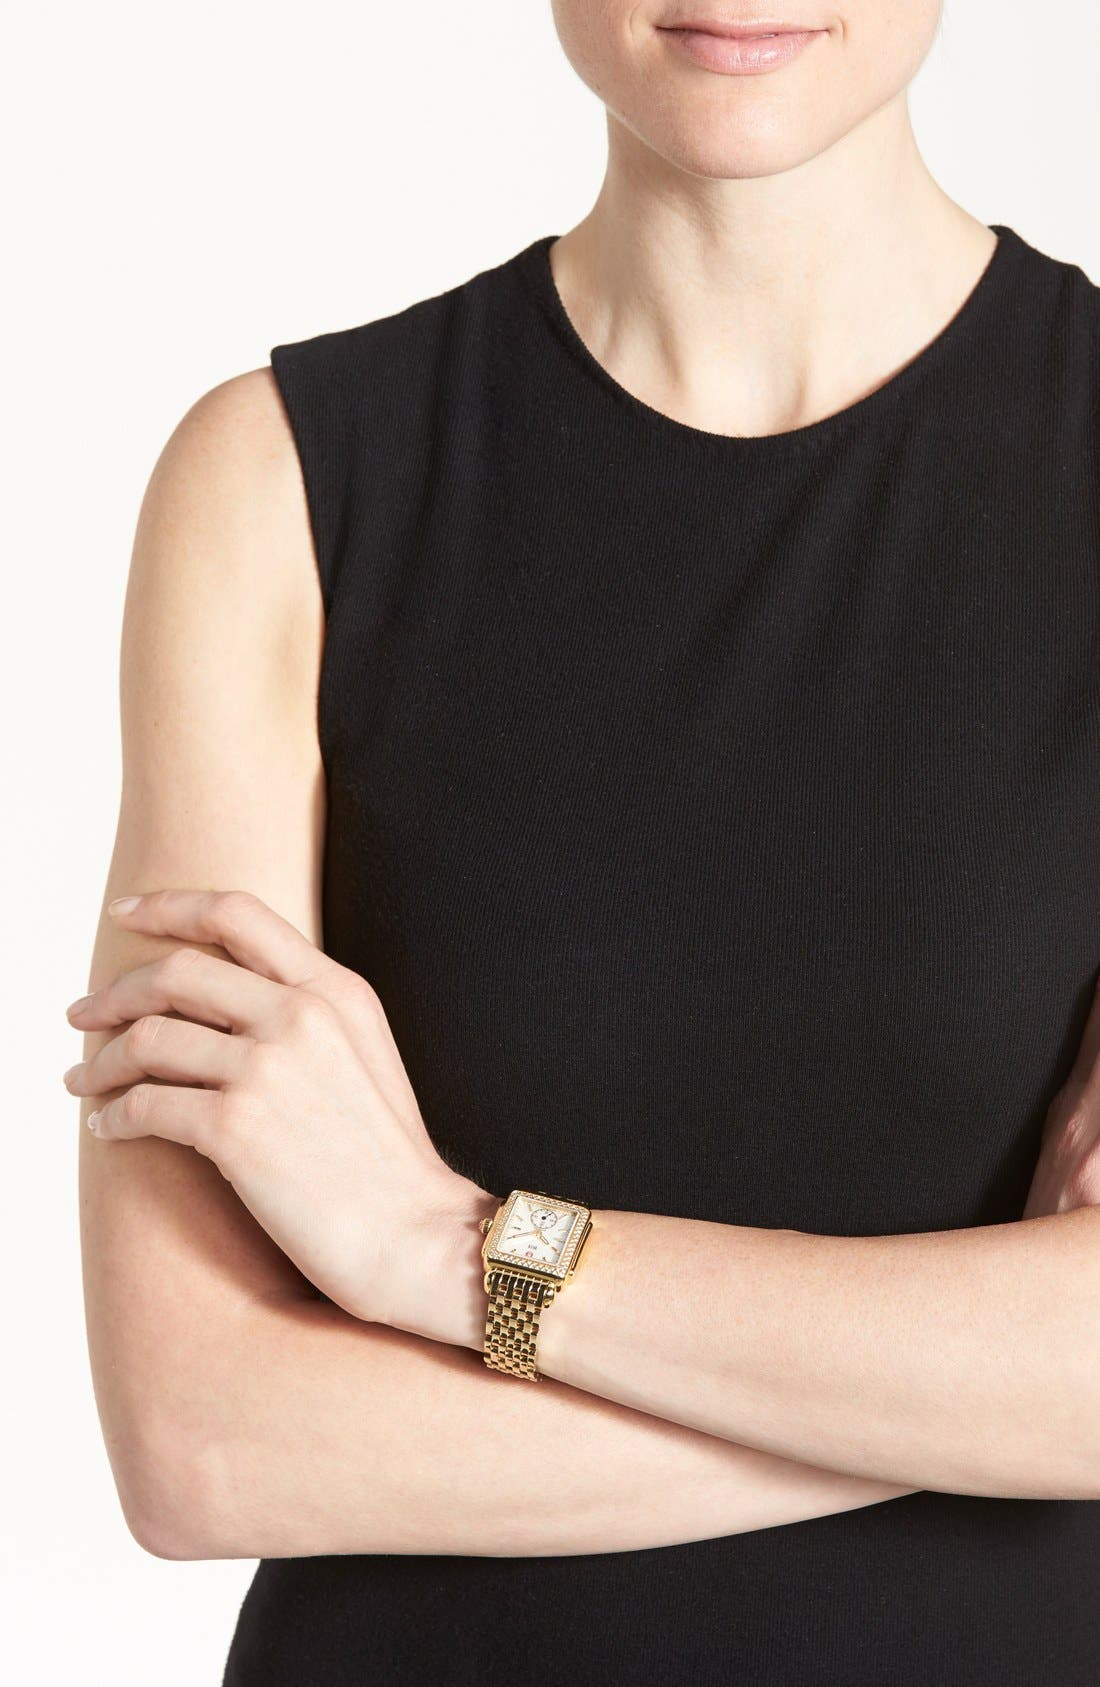 Alternate Image 3  - MICHELE Deco 16 Diamond Gold Plated Watch Head, 29mm x 31mm